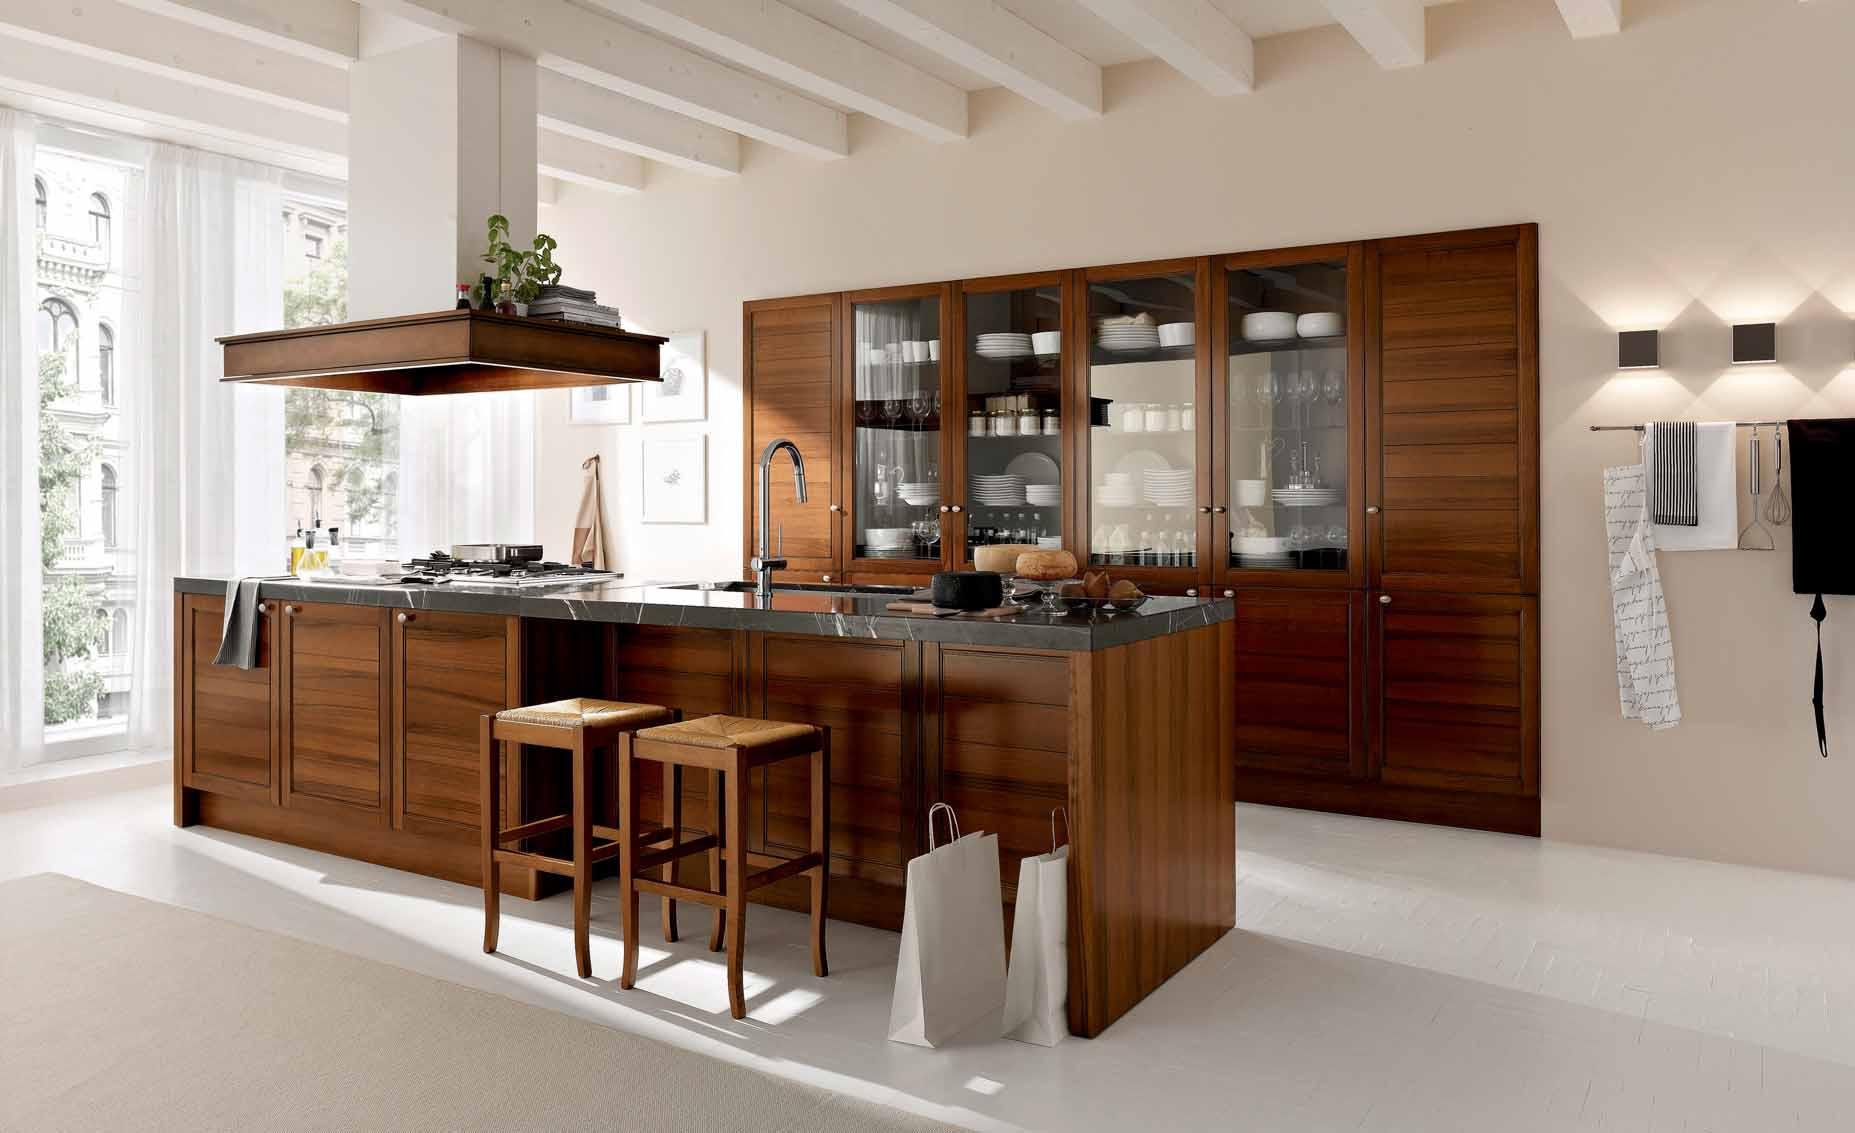 villanova-classique-cuisine-interieur